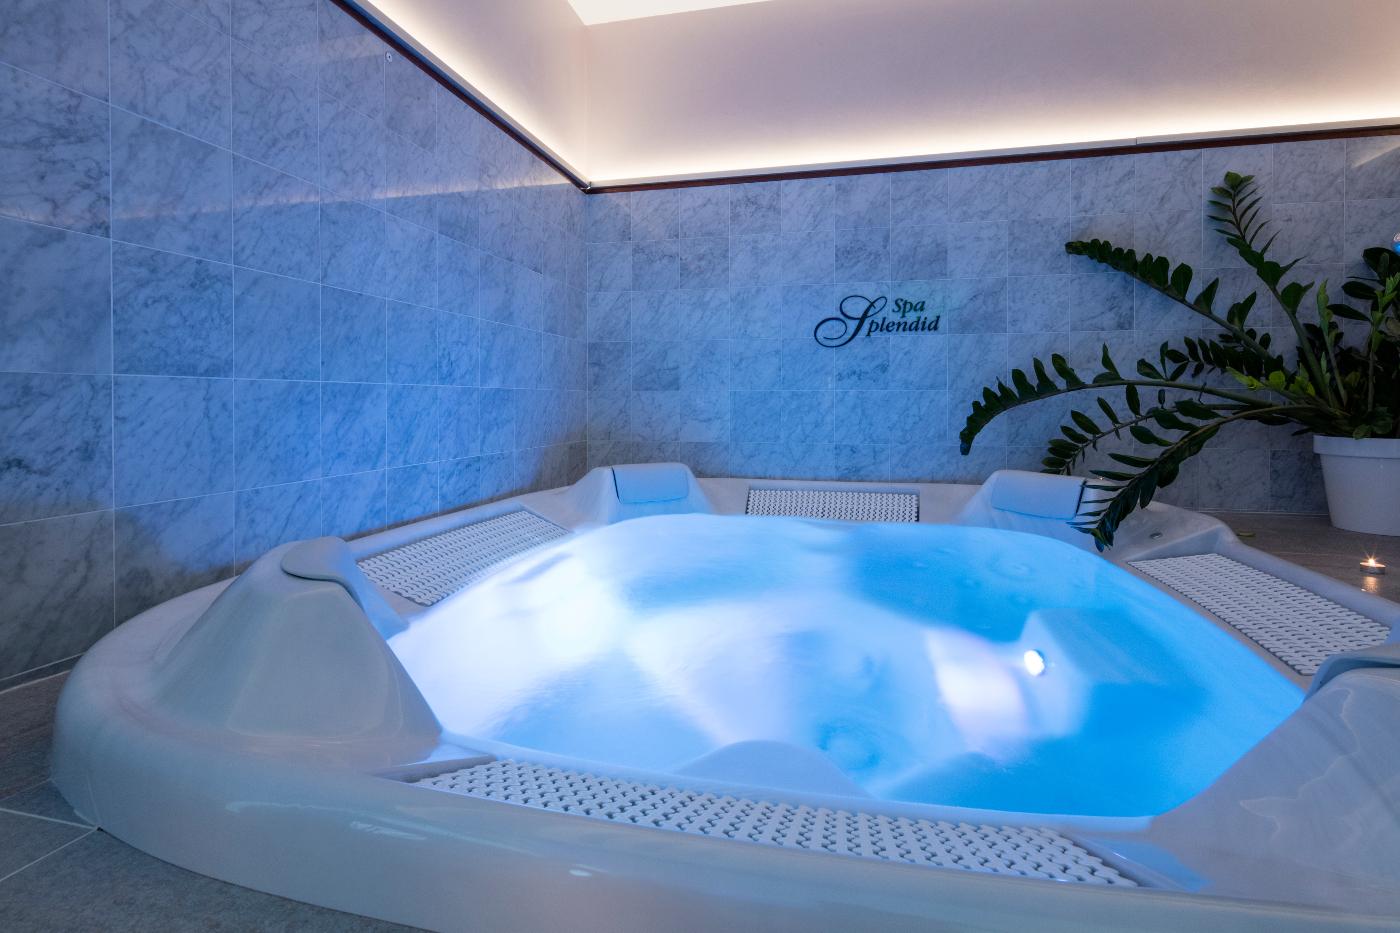 transparenta trosor na thai massage